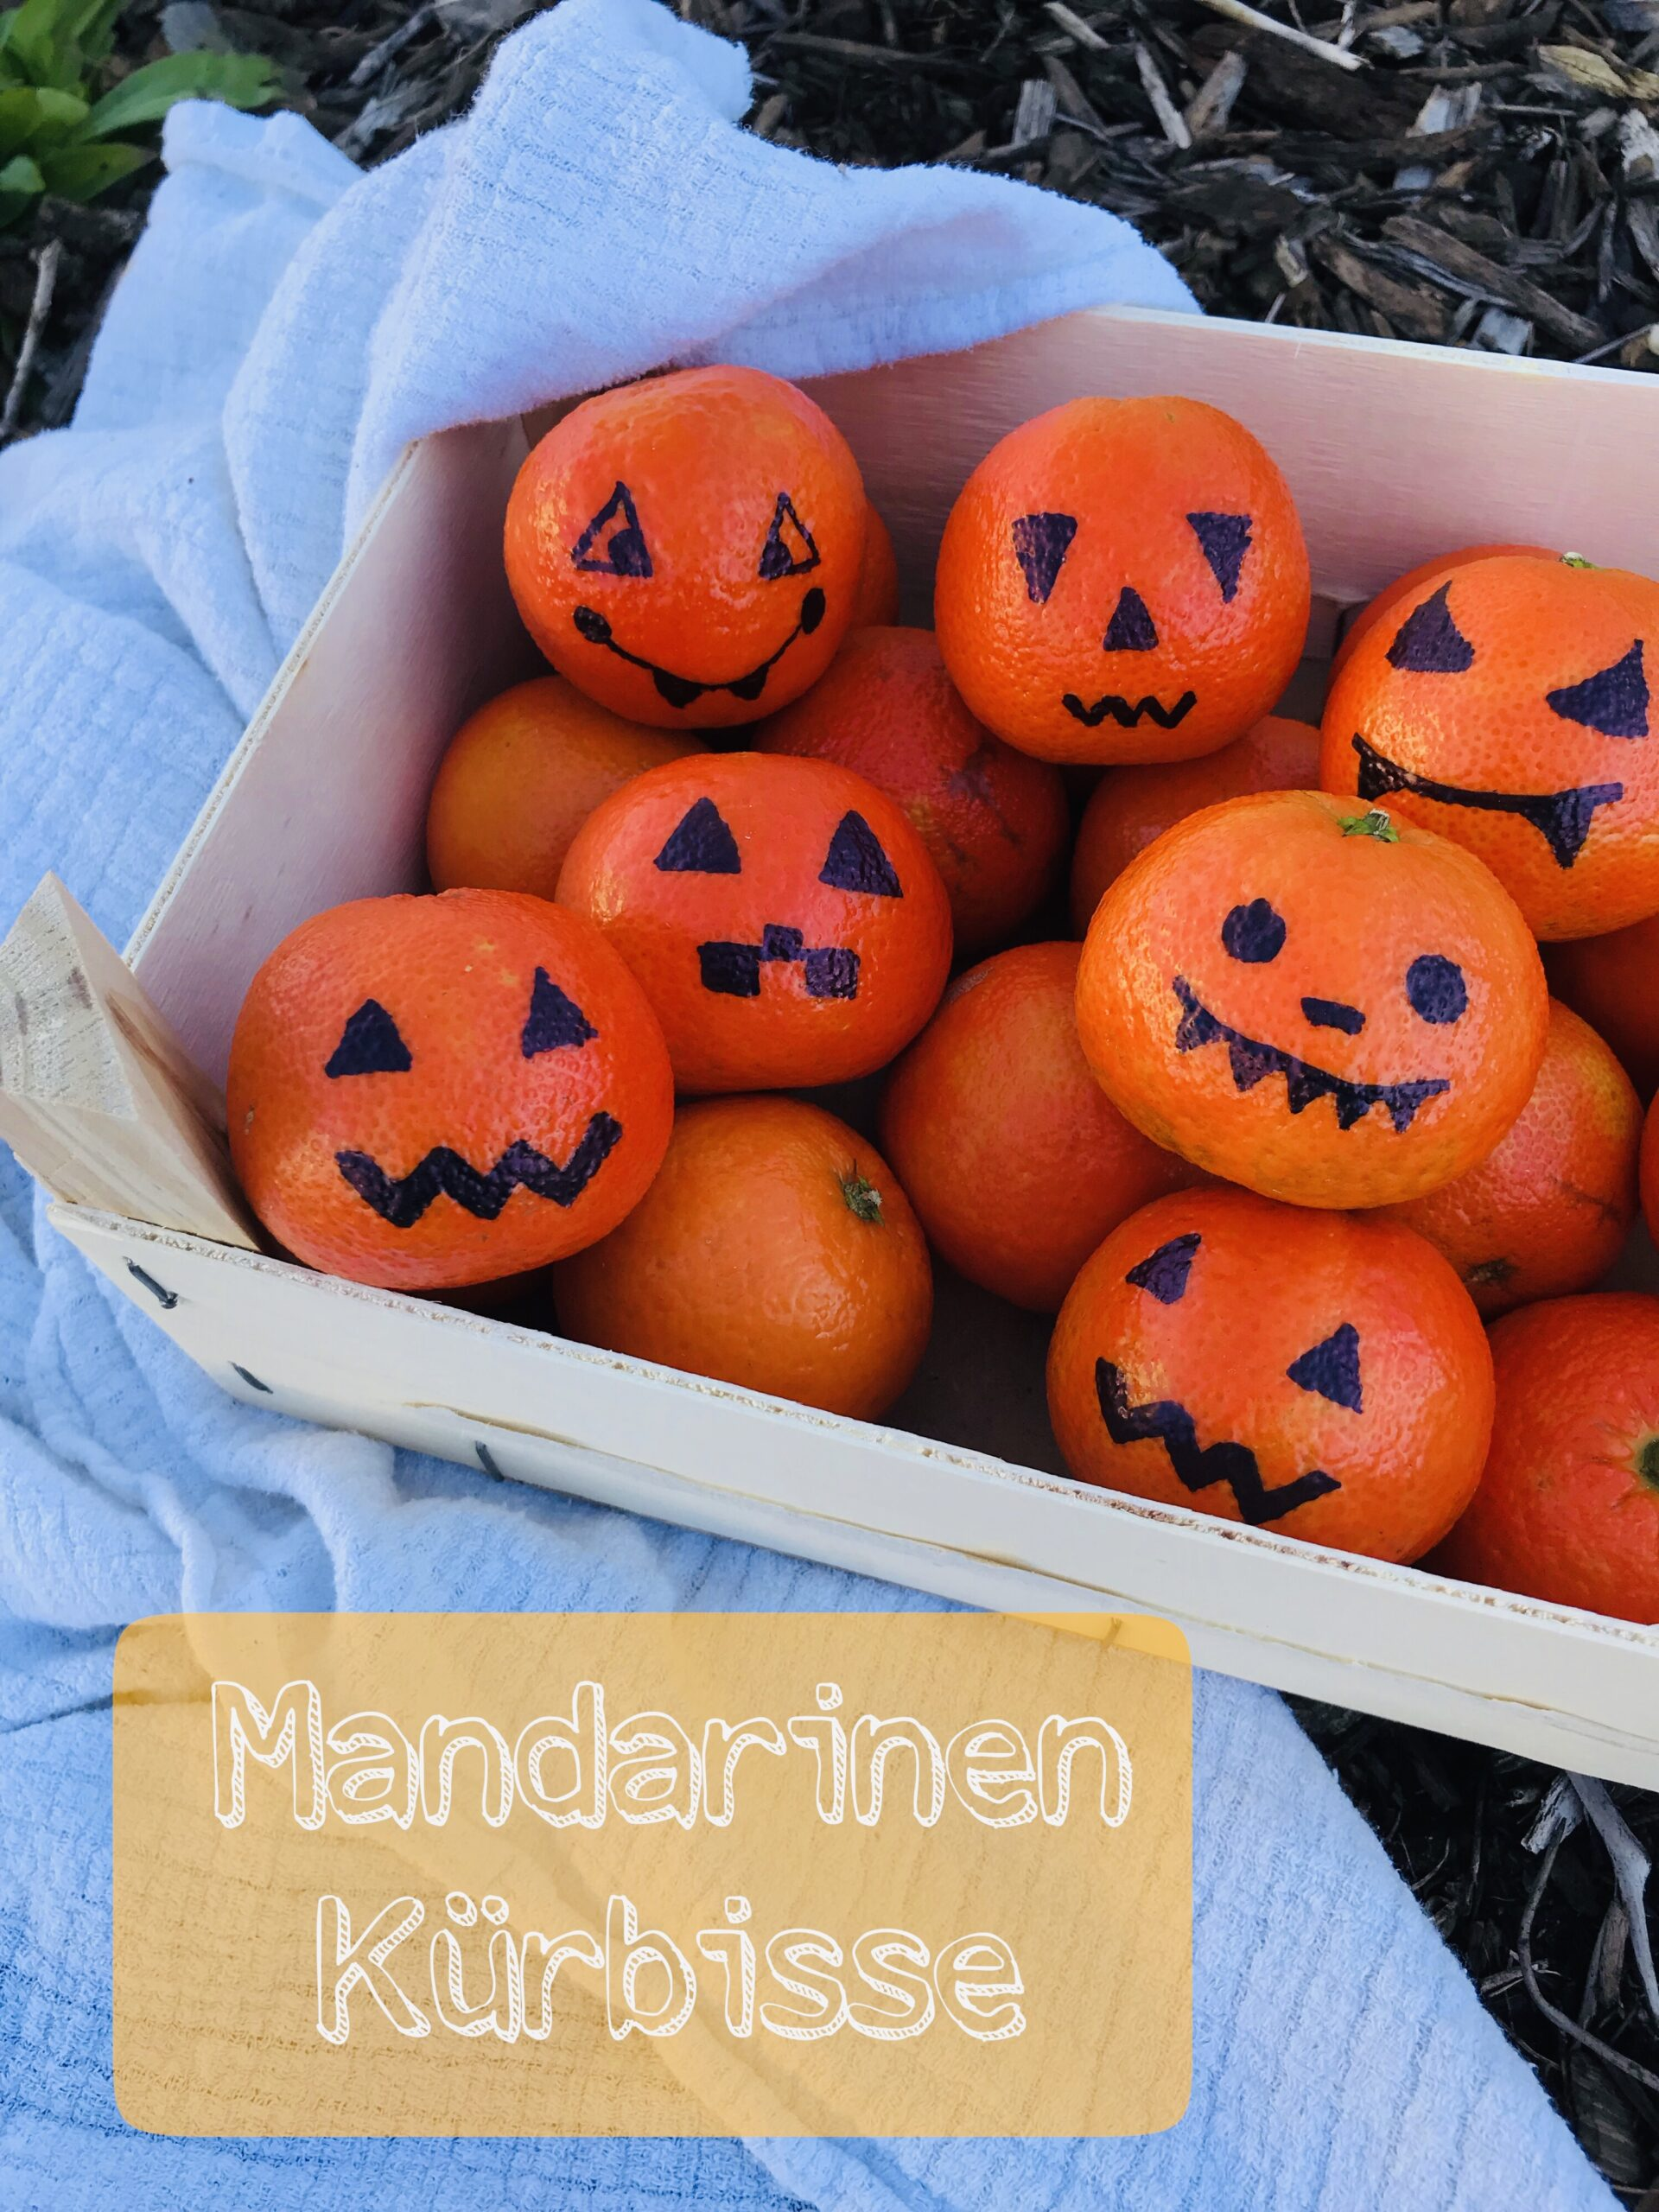 Mandarinen Kürbisse